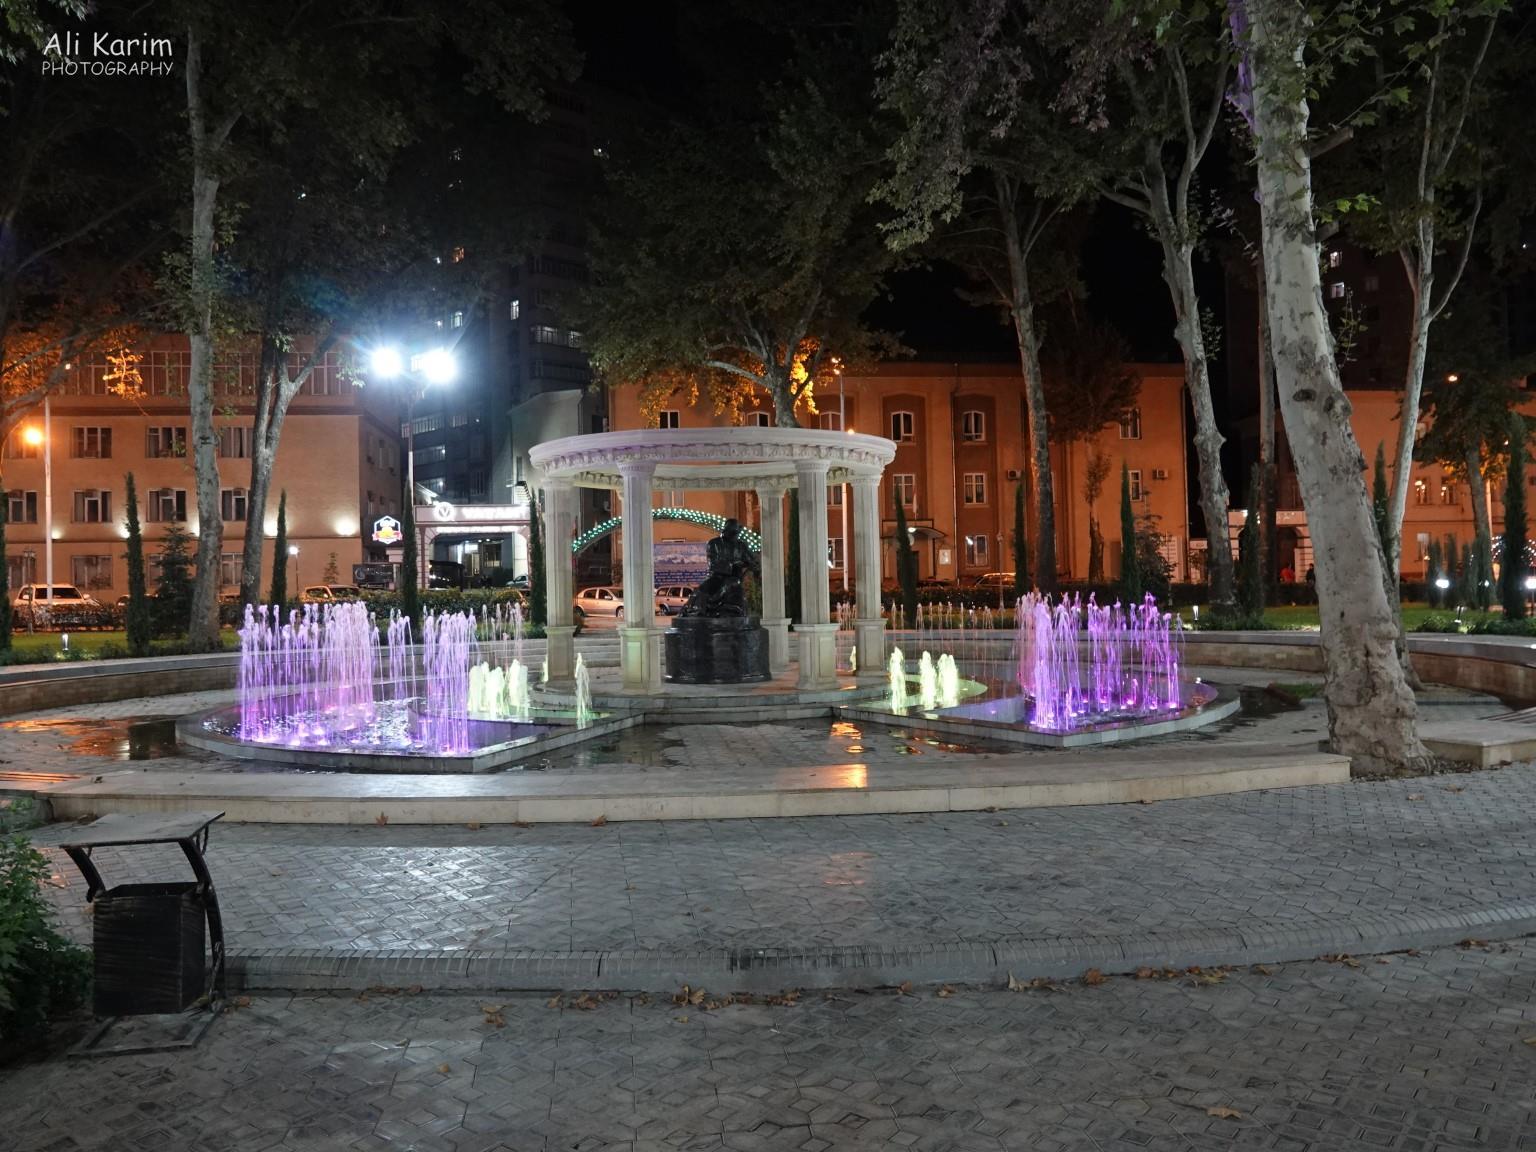 Dushanbe, Tajikistan Fountains inside a park